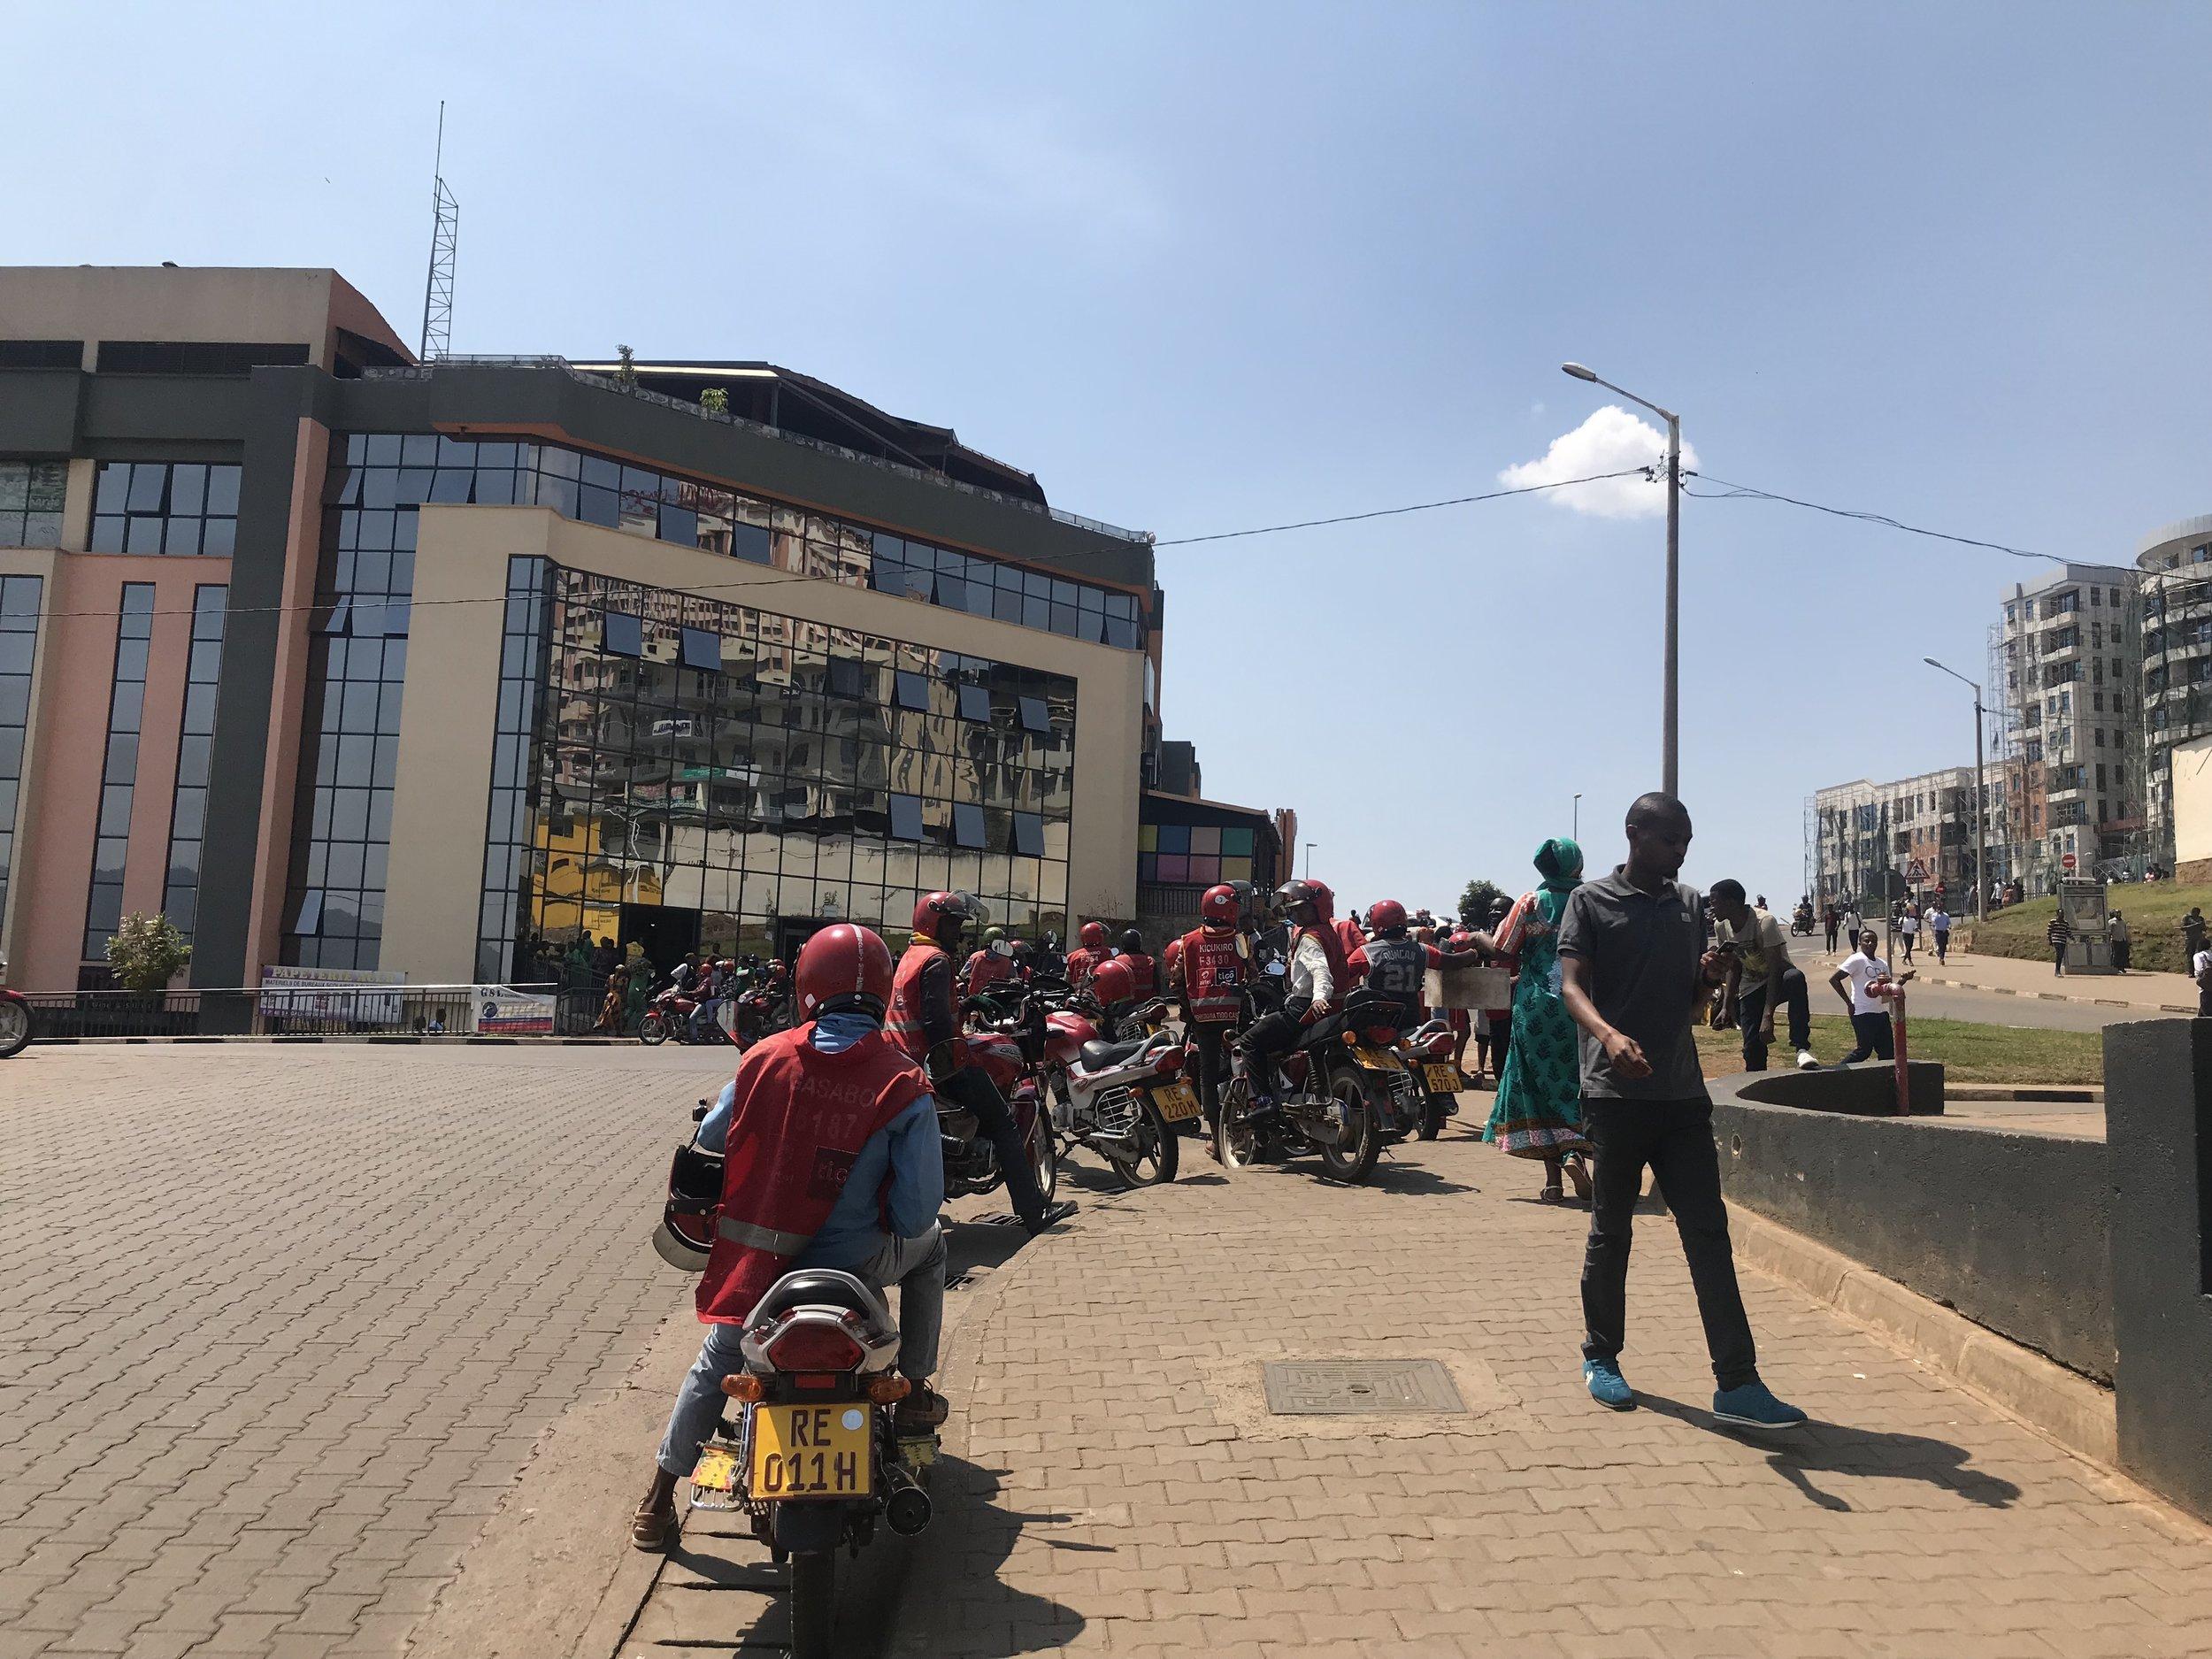 IMG_5626VickieRemoe-travel-kigali-rwanda-review-kwibohora25-hotels-africa.JPG